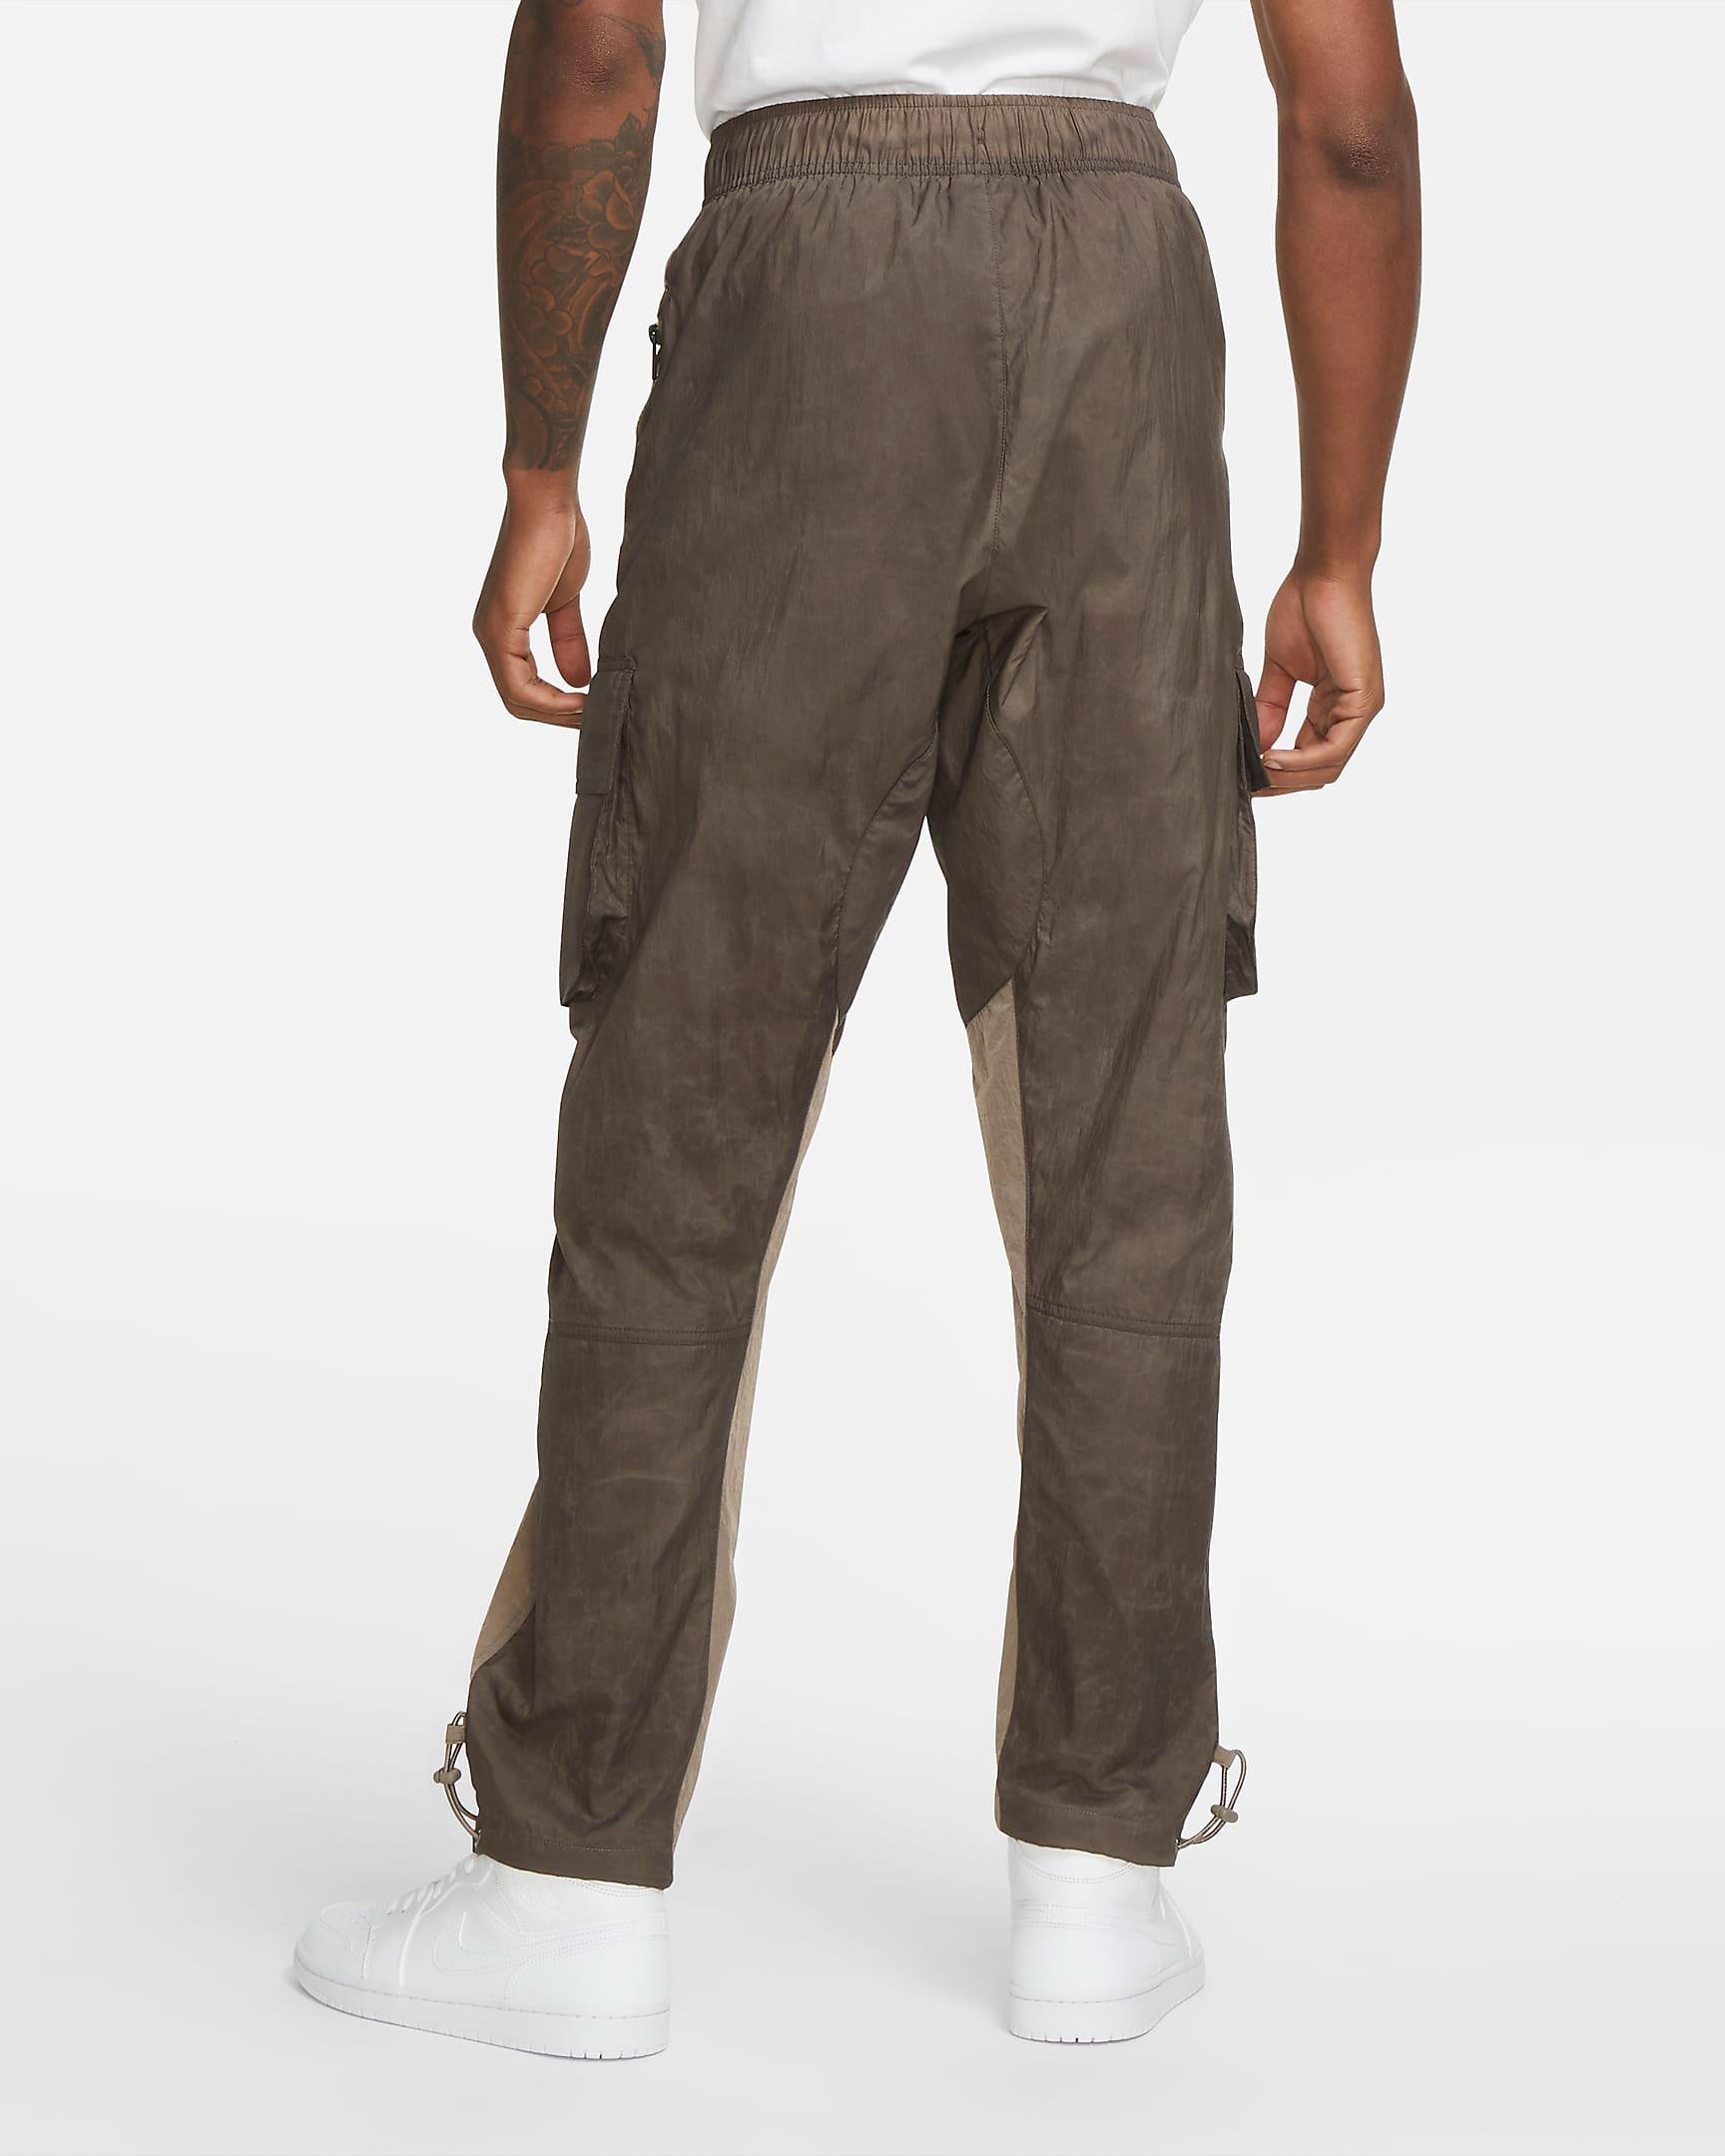 jordan-1-dark-mocha-cargo-pants-match-2